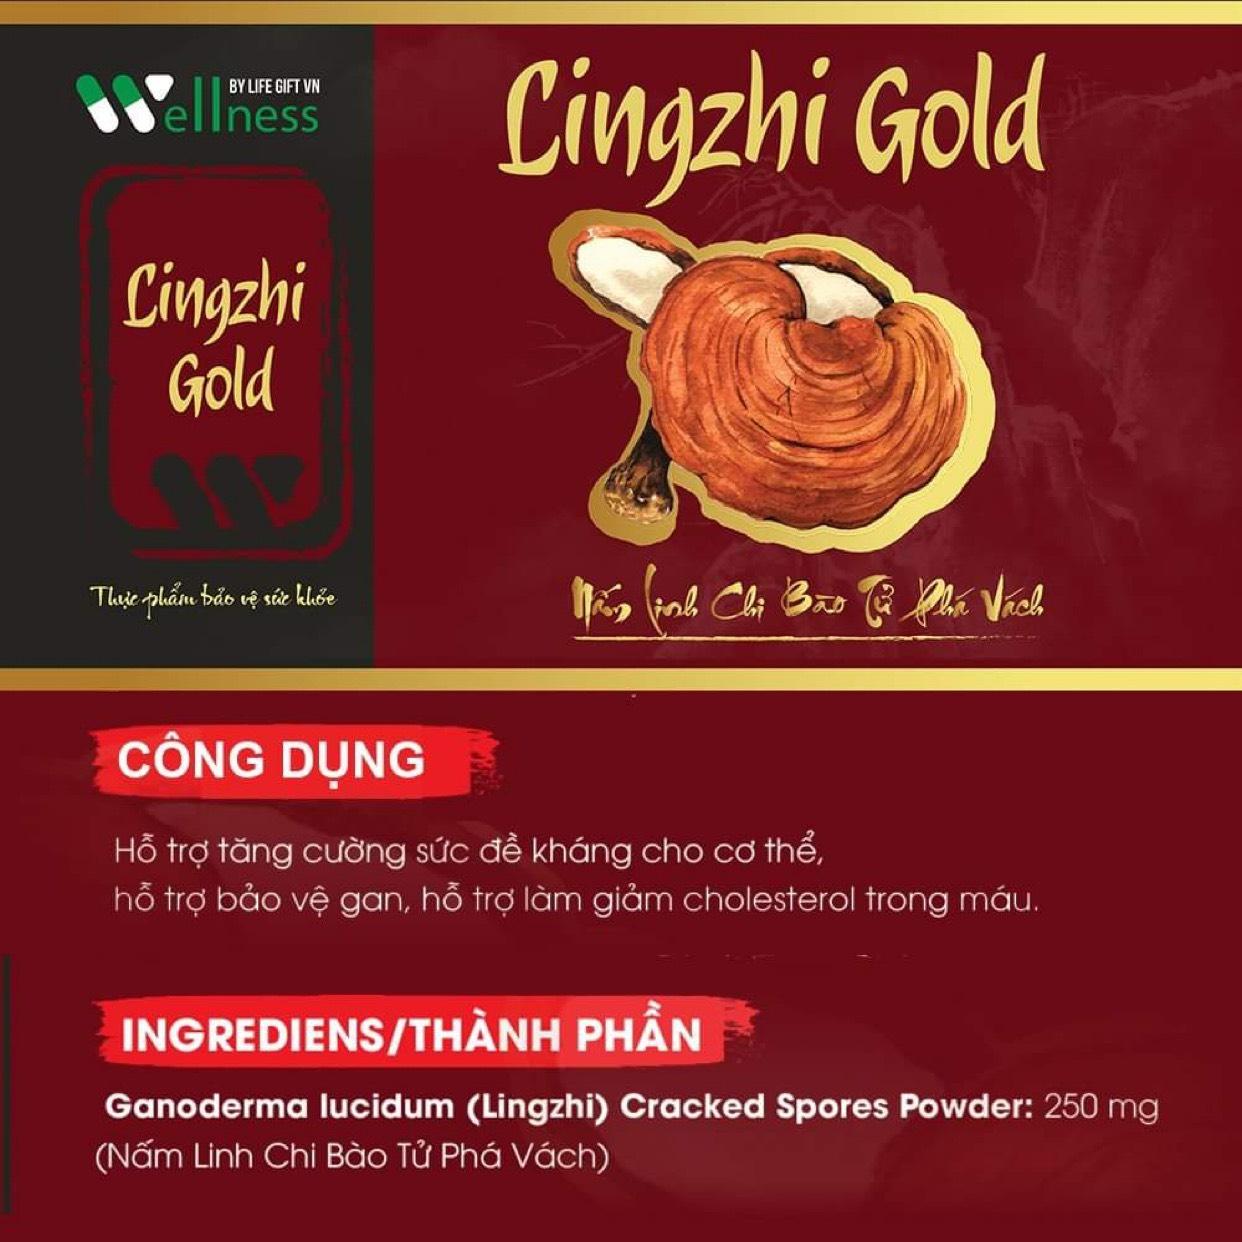 Lingzhi Gold